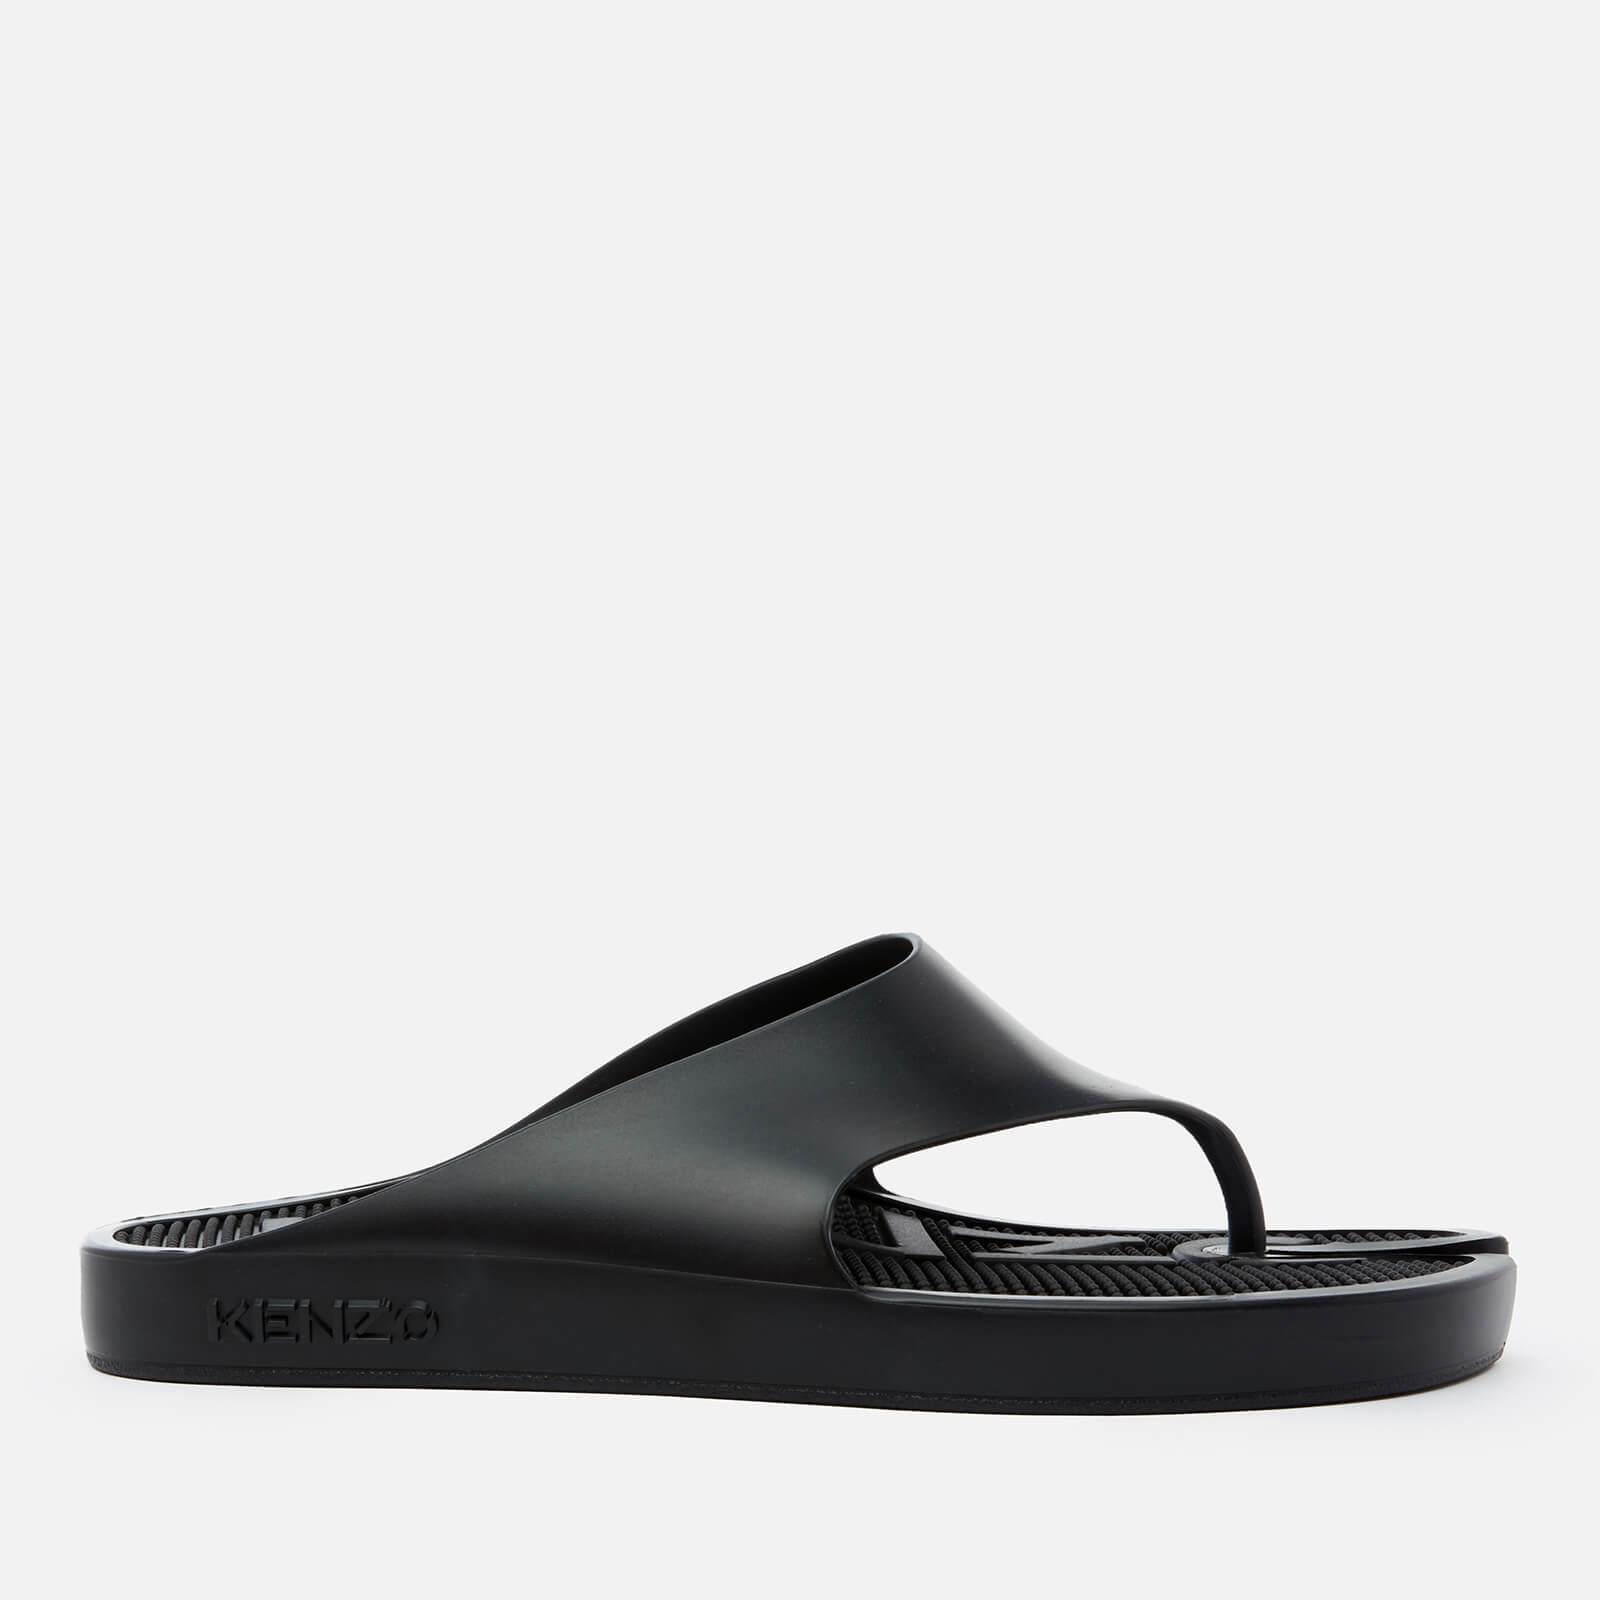 KENZO Men's New Flip Flops - Black - UK 7